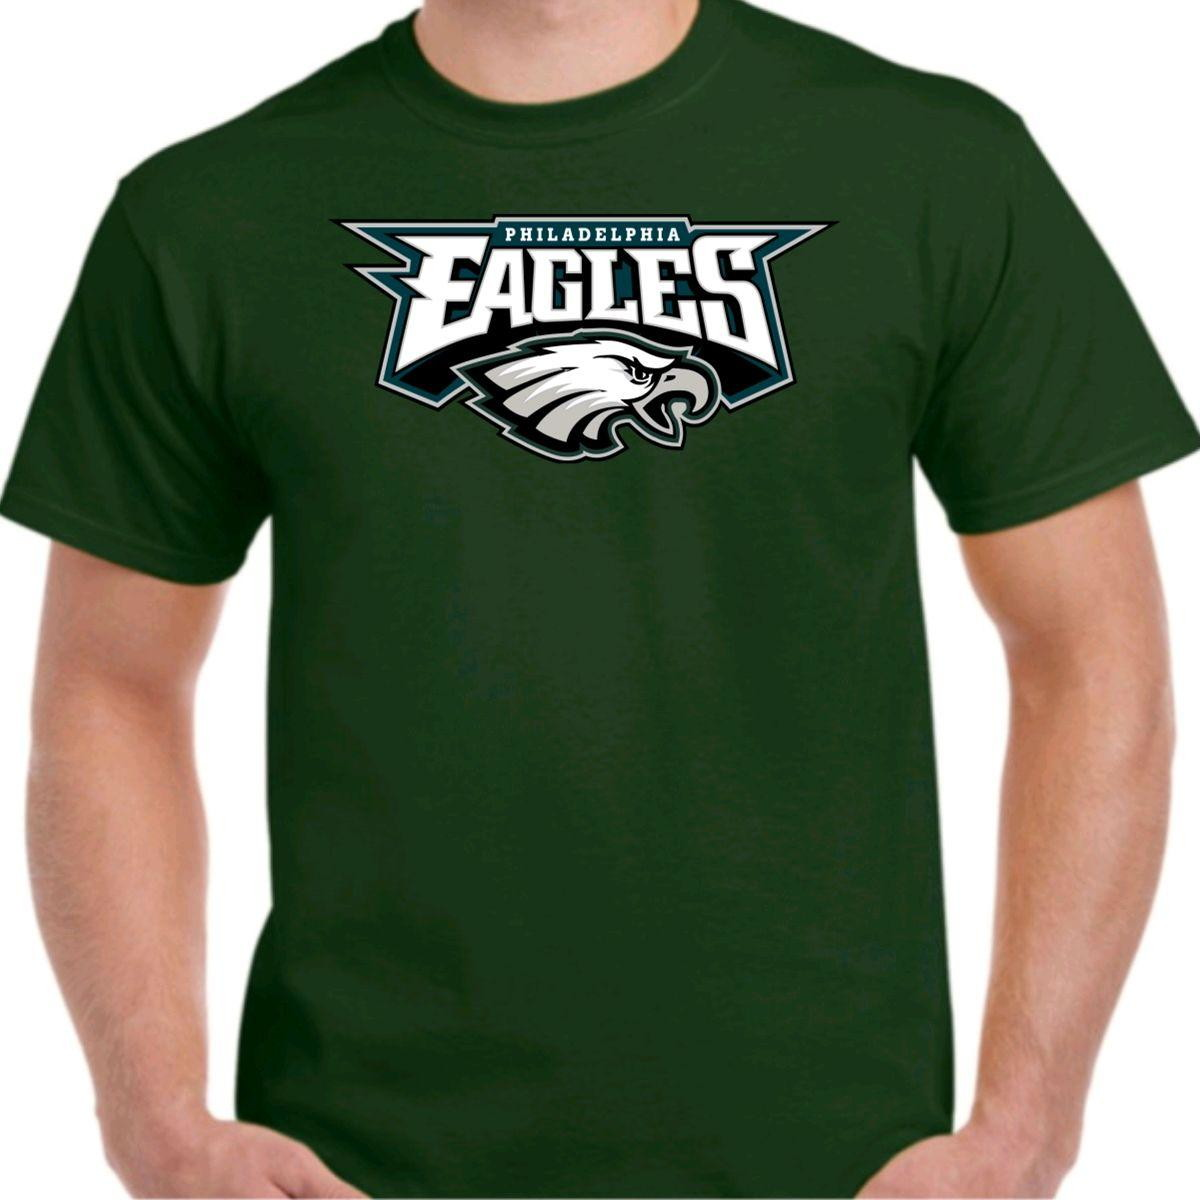 Camisas de times de futebol americano 2 no Elo7  0a5c64cf9ba2d